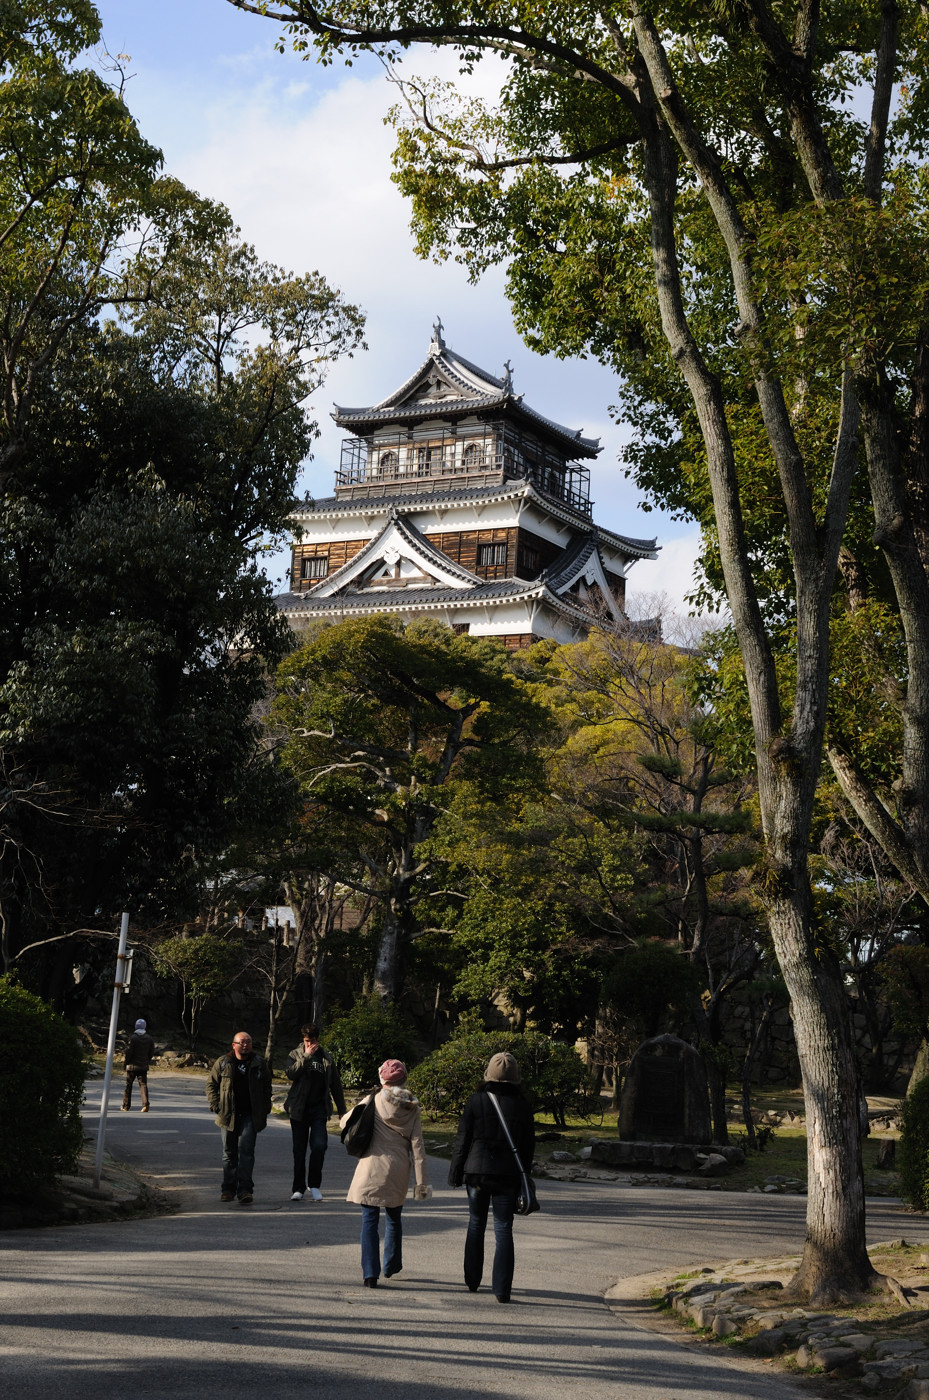 広島城と観光者